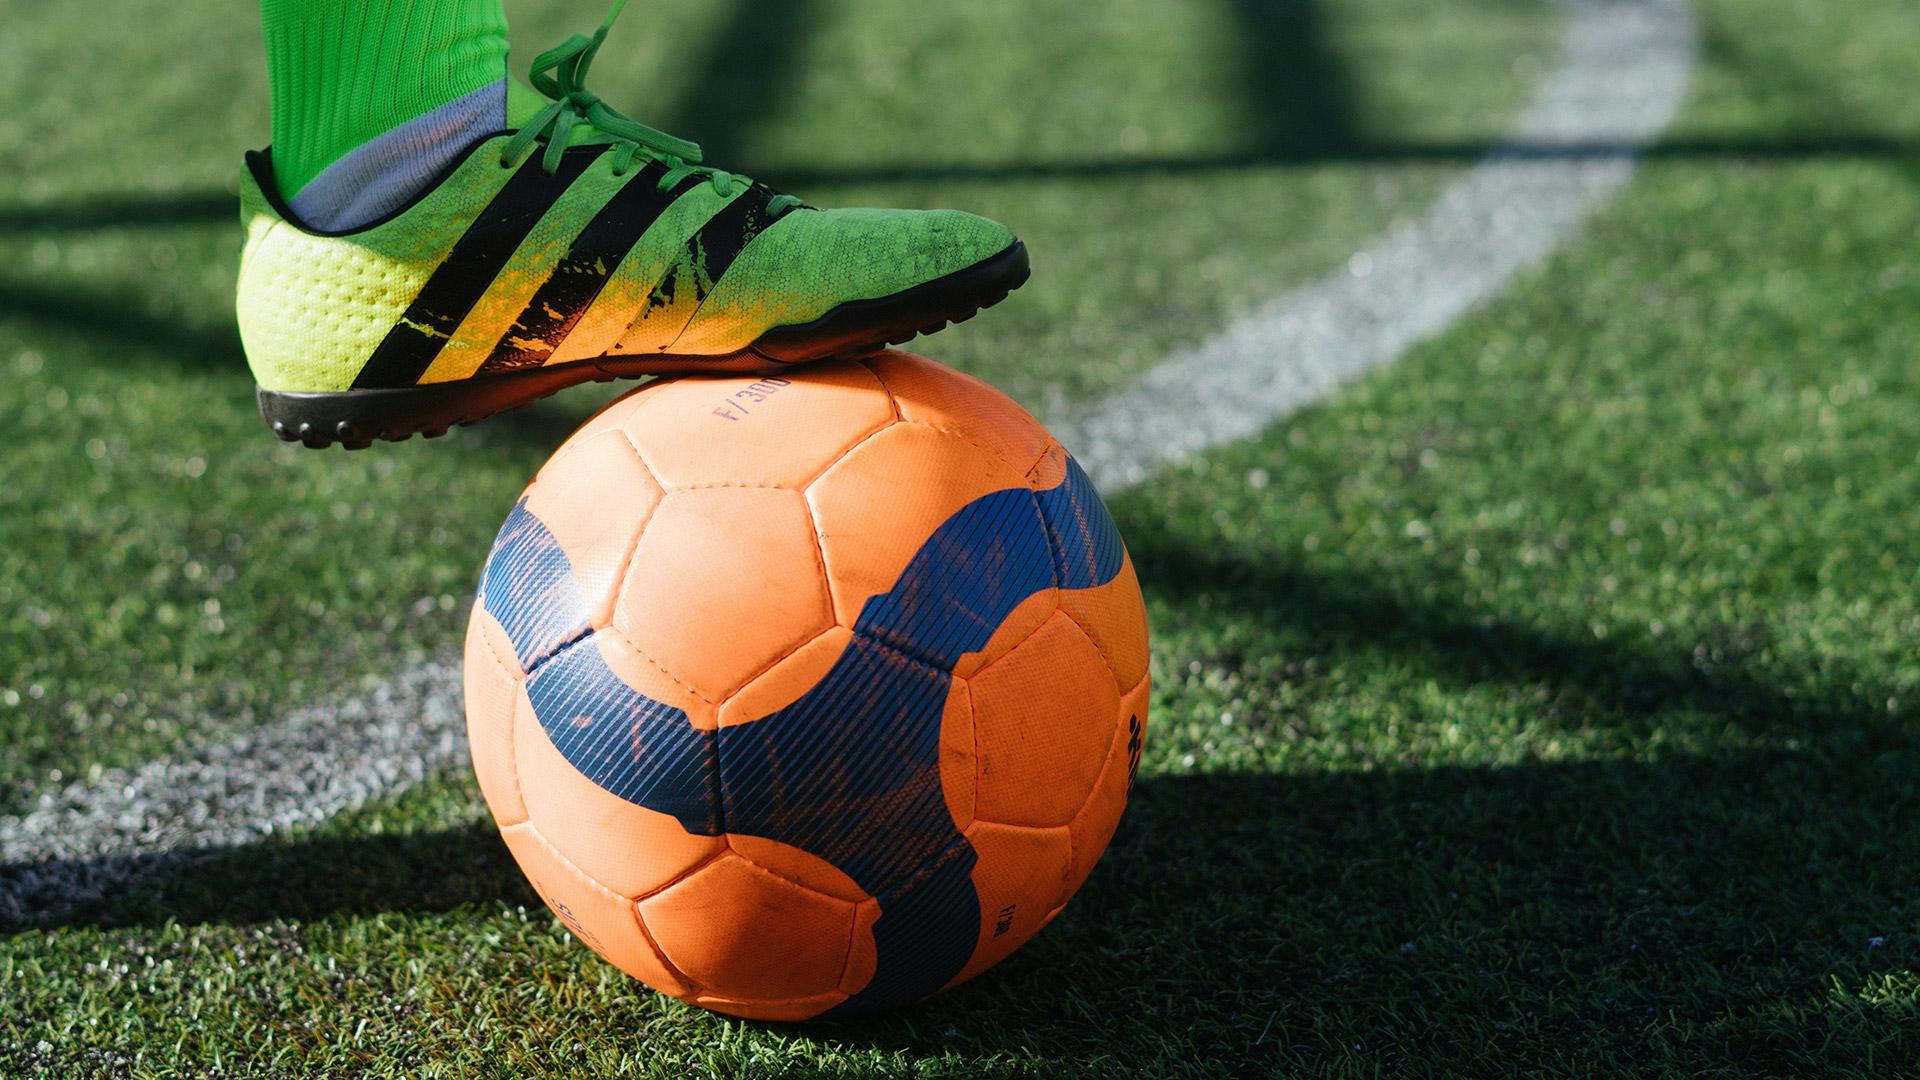 Bina-Qurani-Pengertian-Sepak-Bola